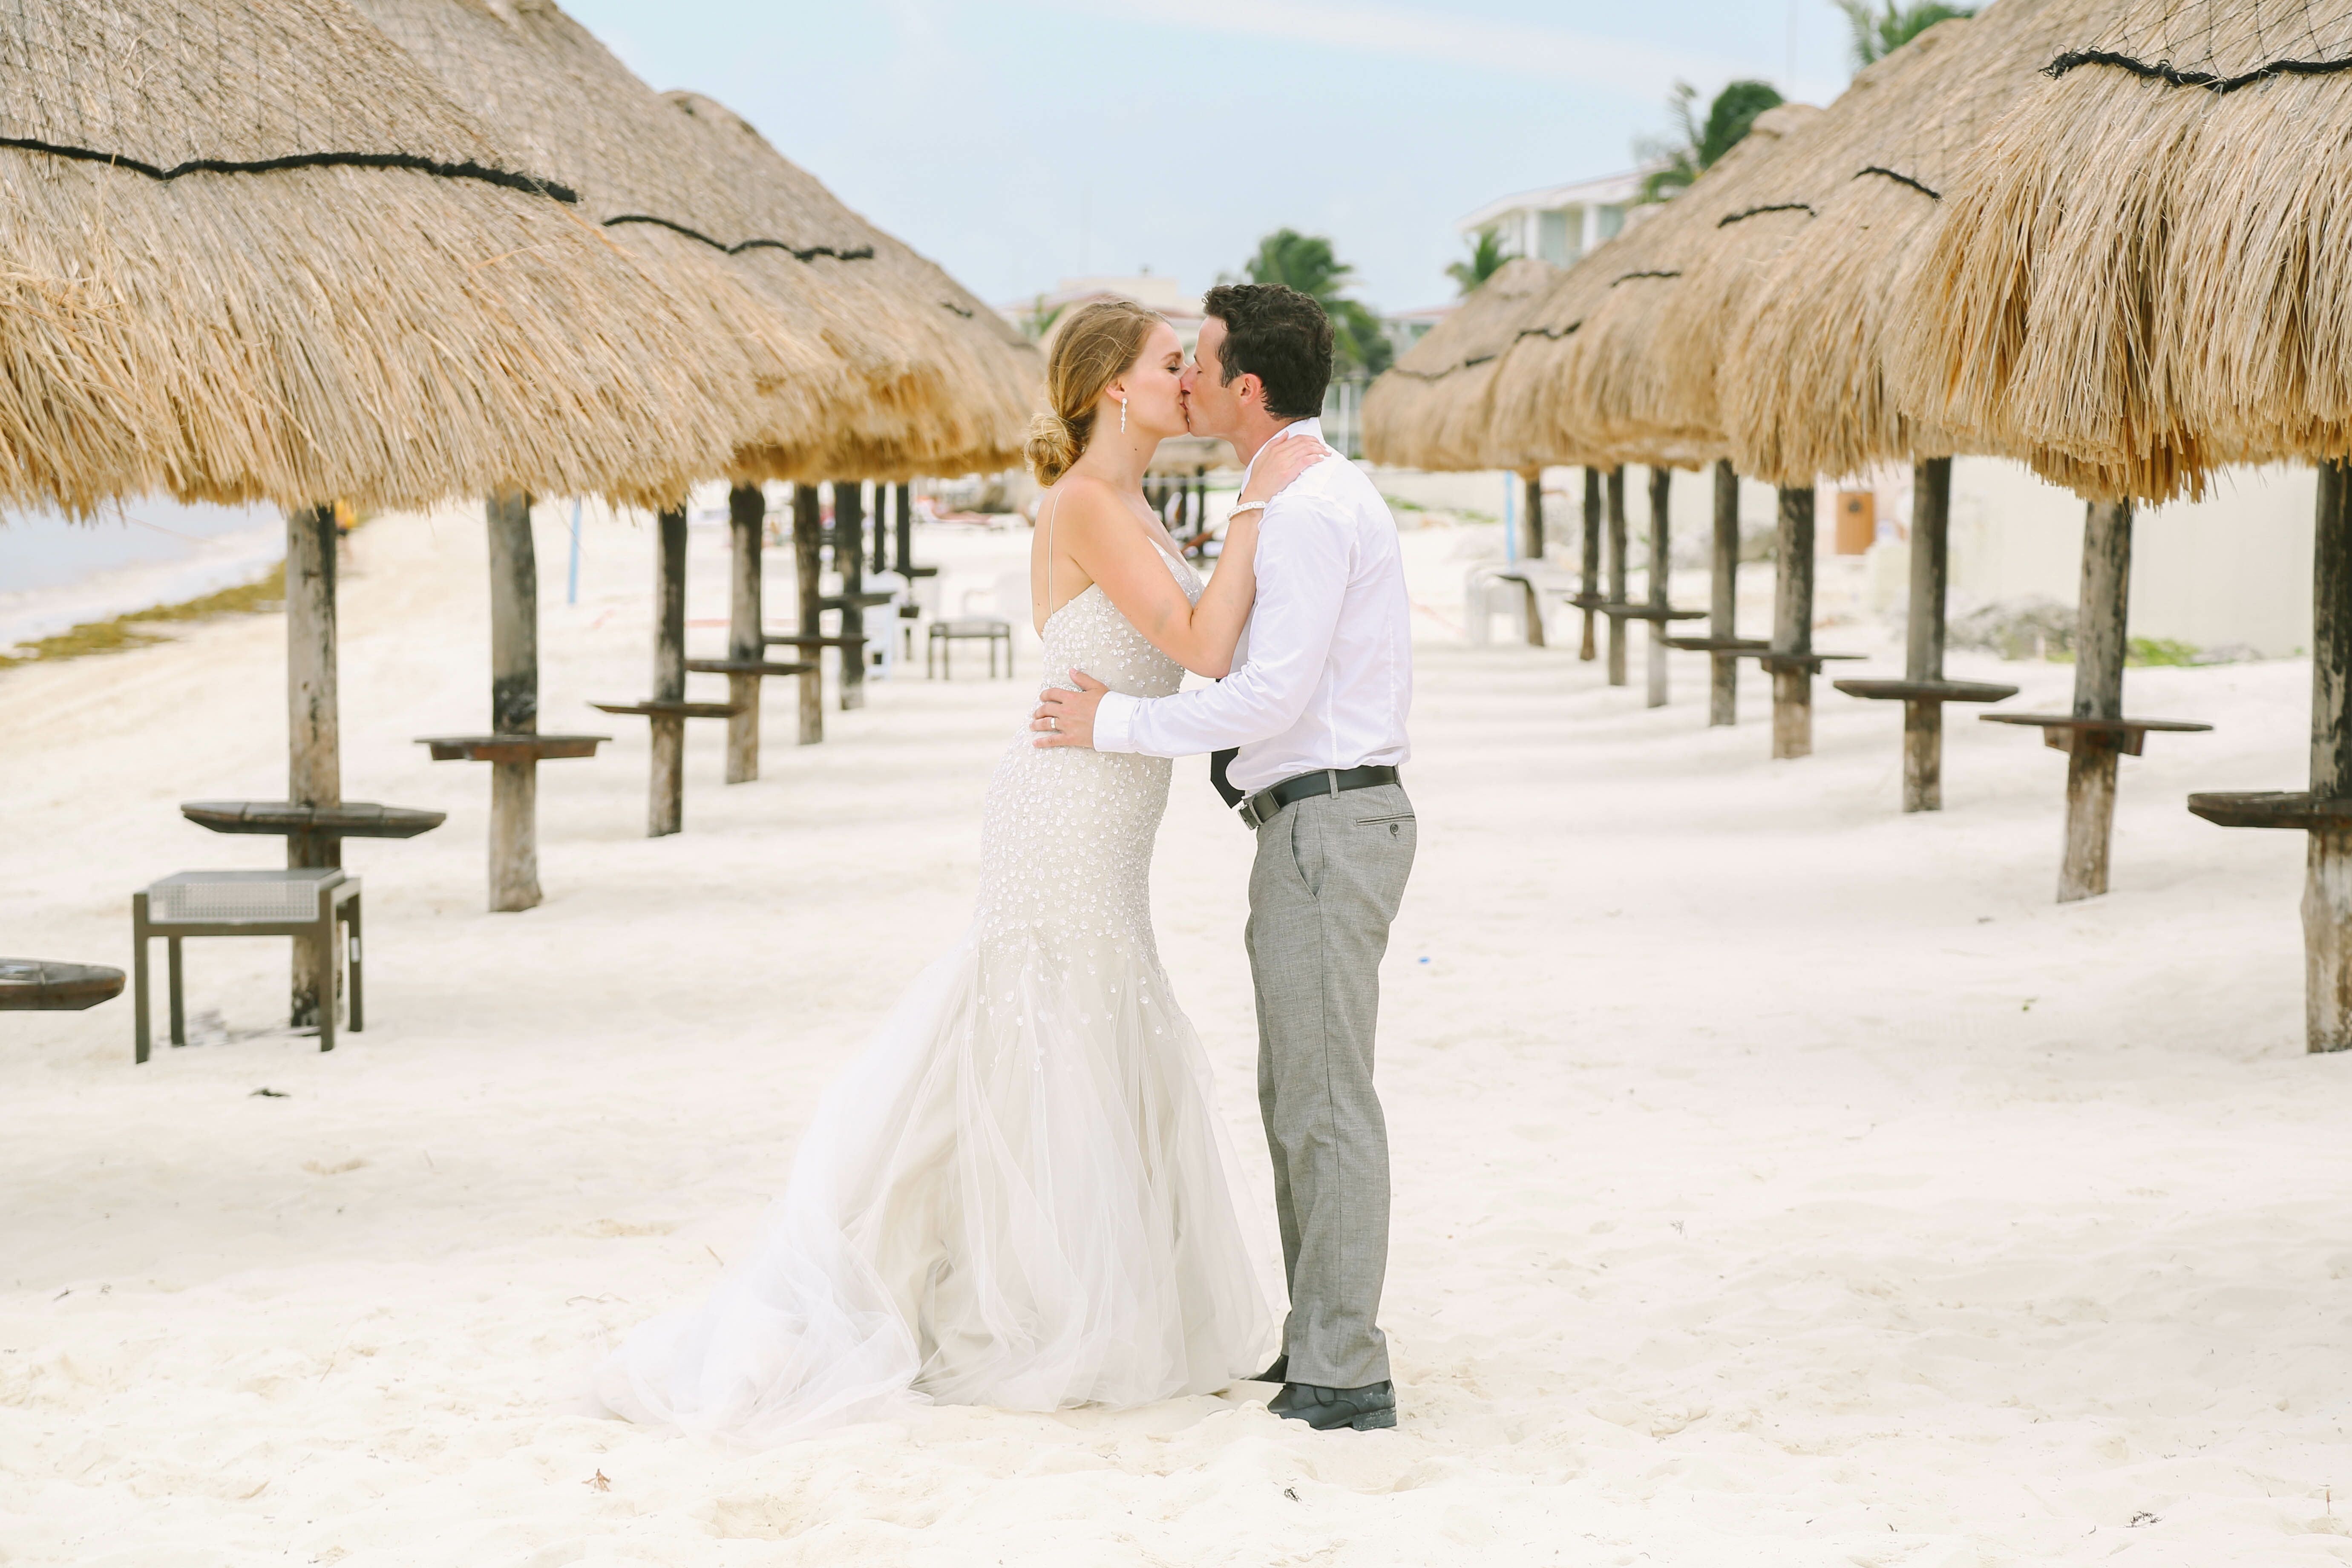 A Beach Destination Wedding At Moon Palace Golf Spa Resort In Cancun Mexico